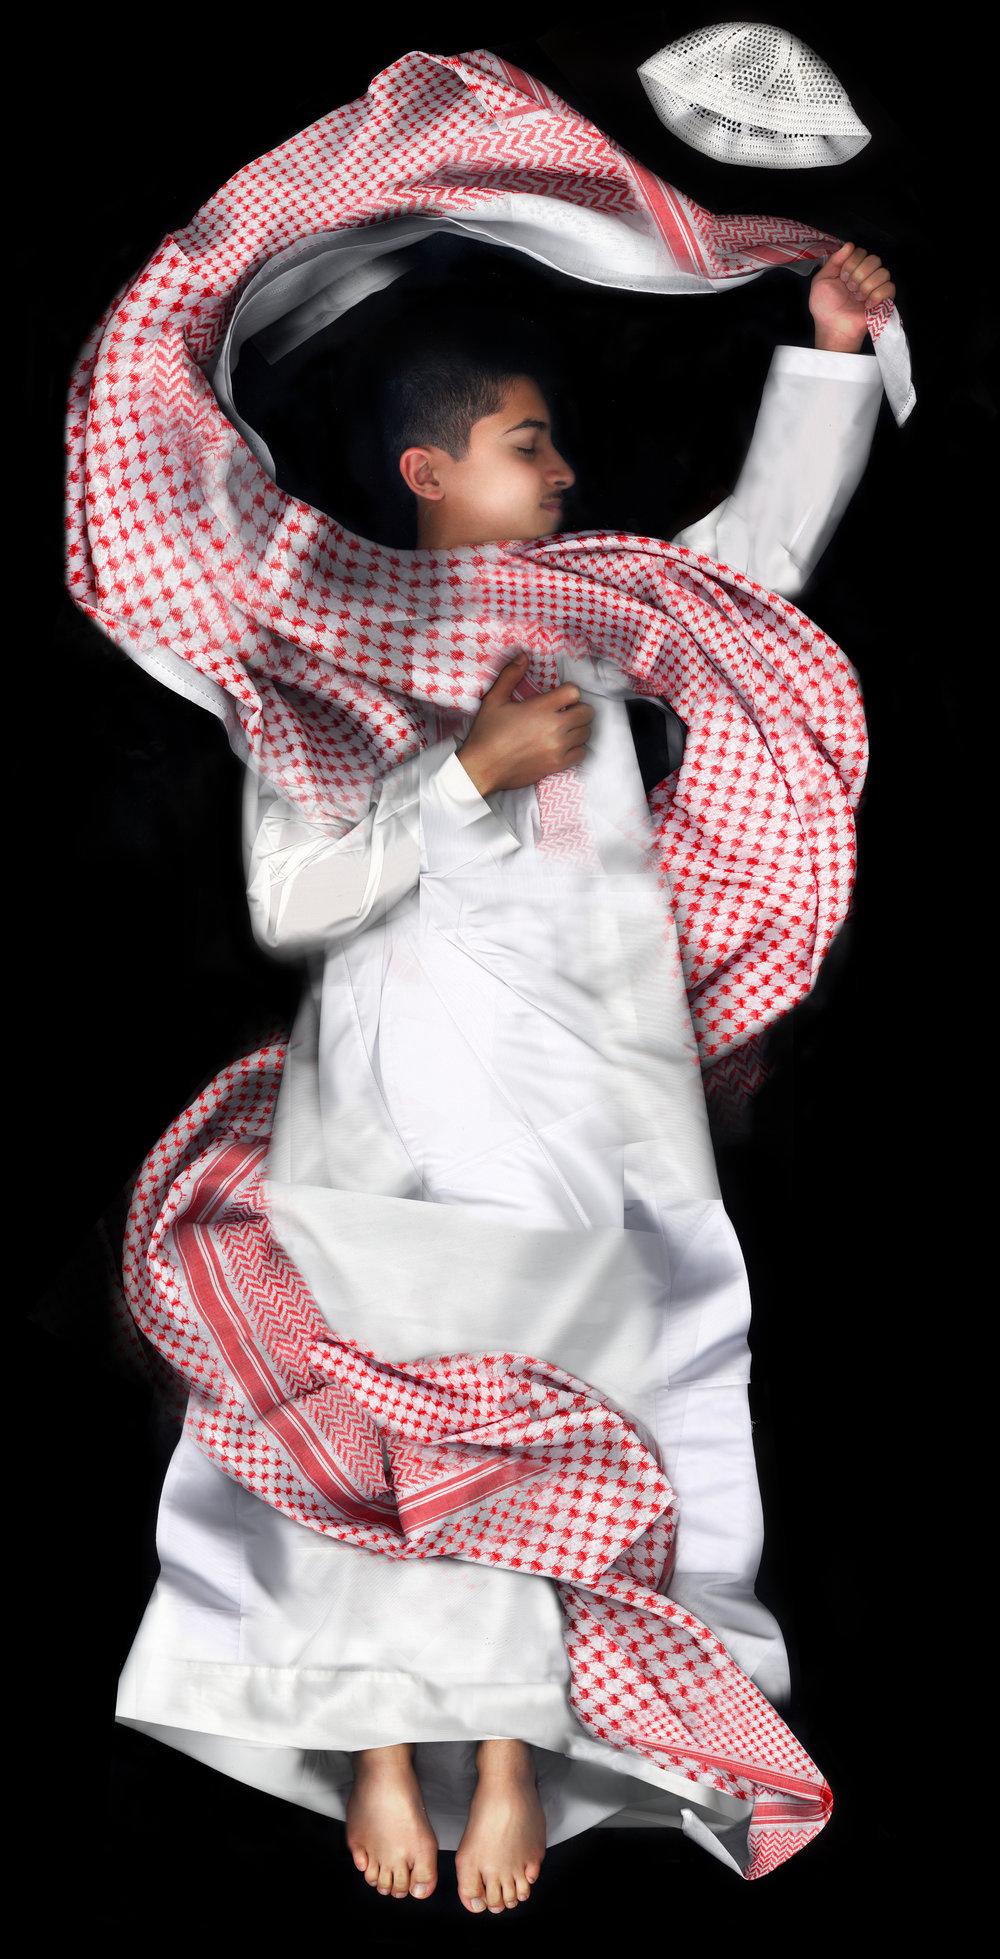 Omar-2.jpg